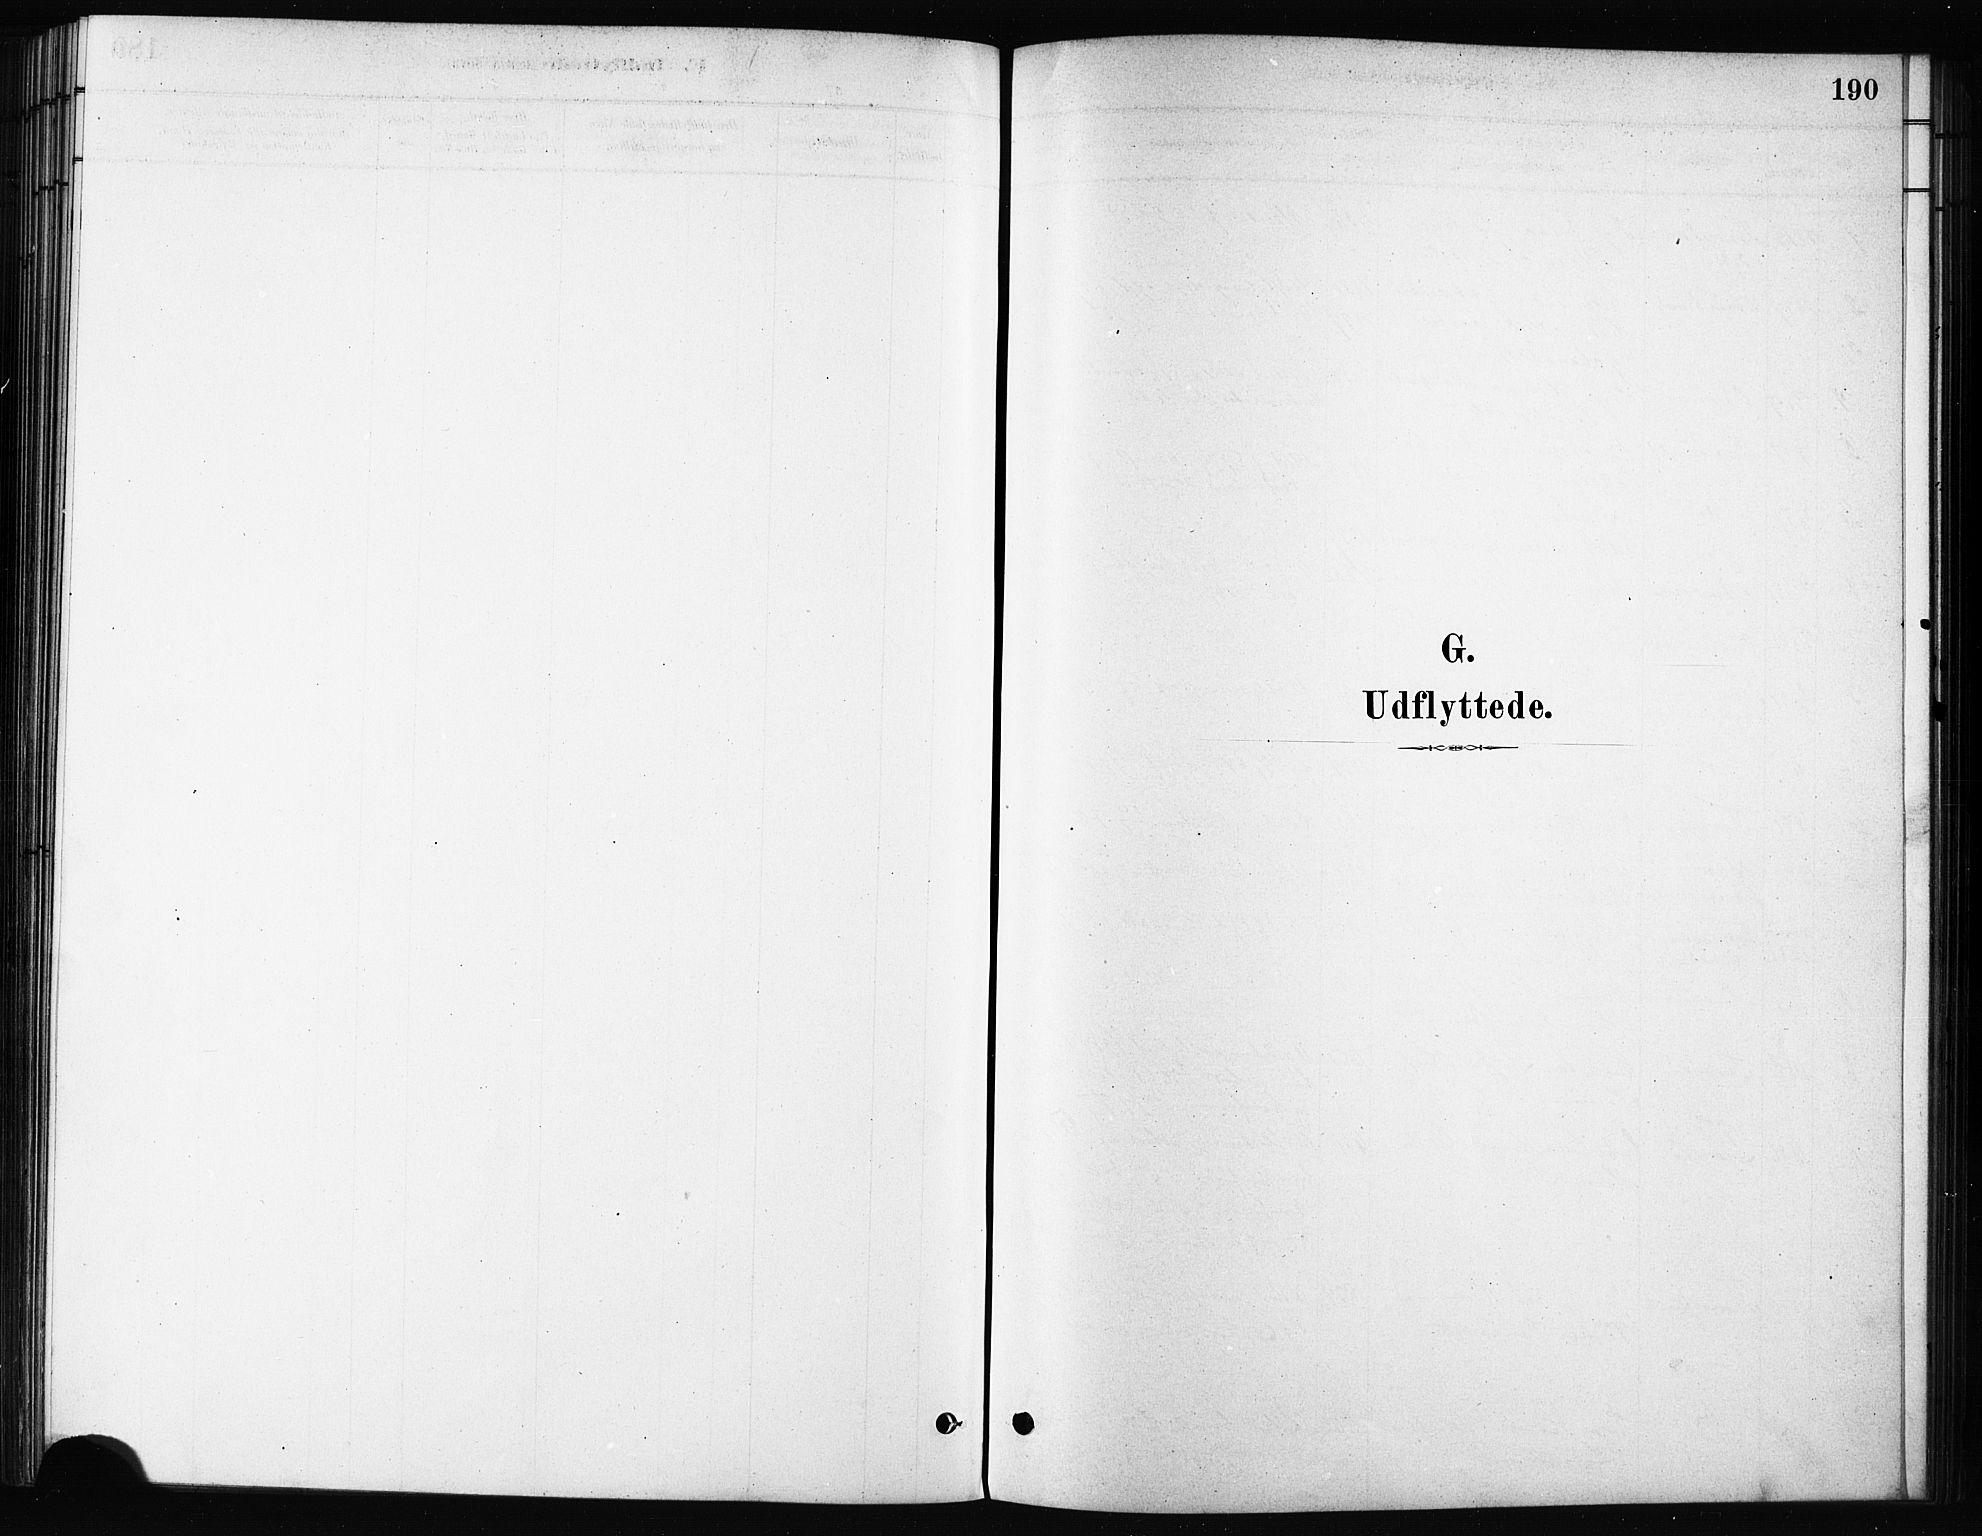 SATØ, Karlsøy sokneprestembete, H/Ha/Haa/L0011kirke: Parish register (official) no. 11, 1879-1892, p. 190